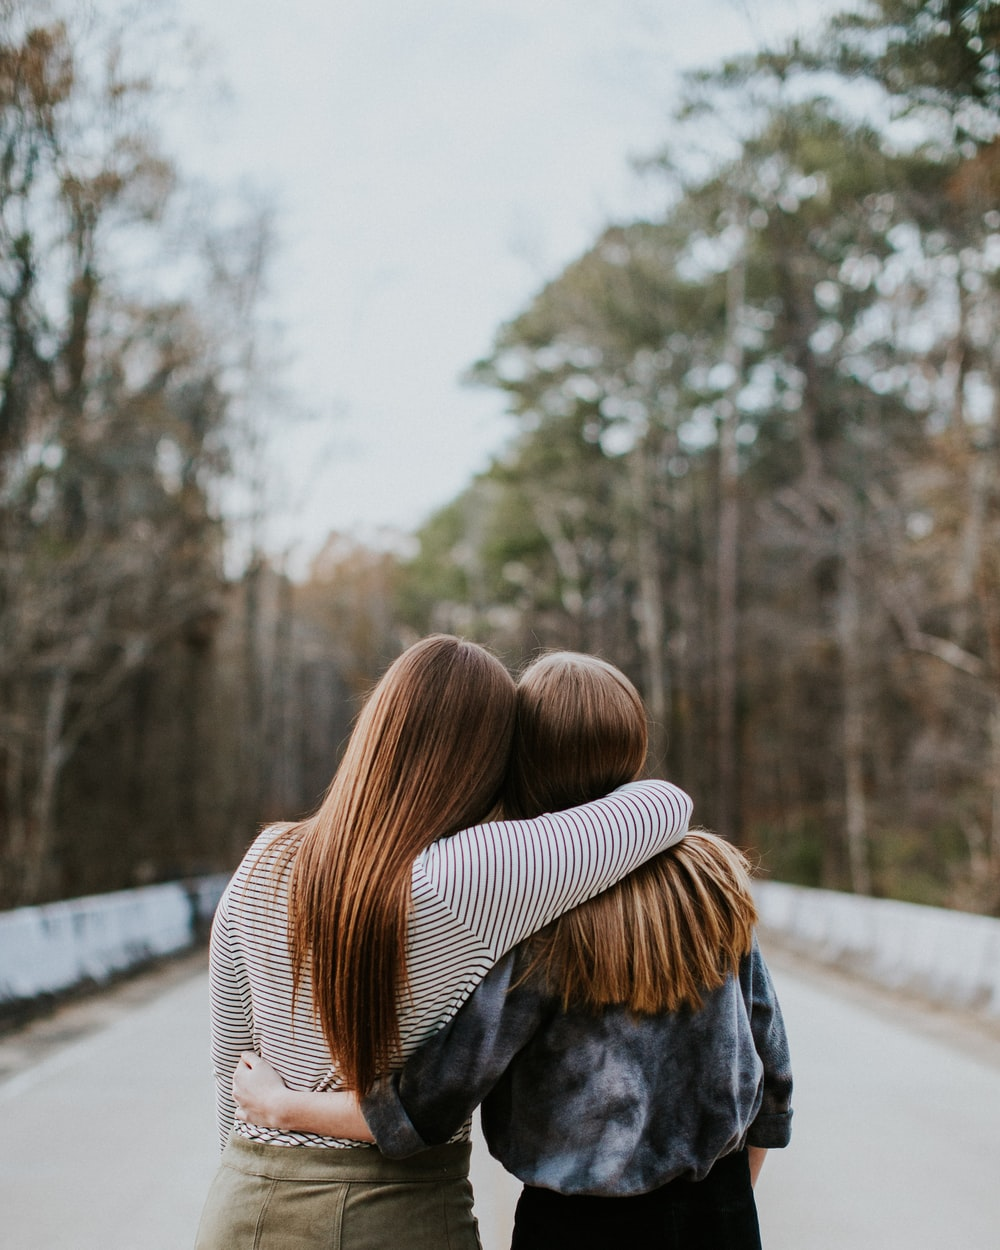 500 Best Friend Images Download Free Pictures On Unsplash